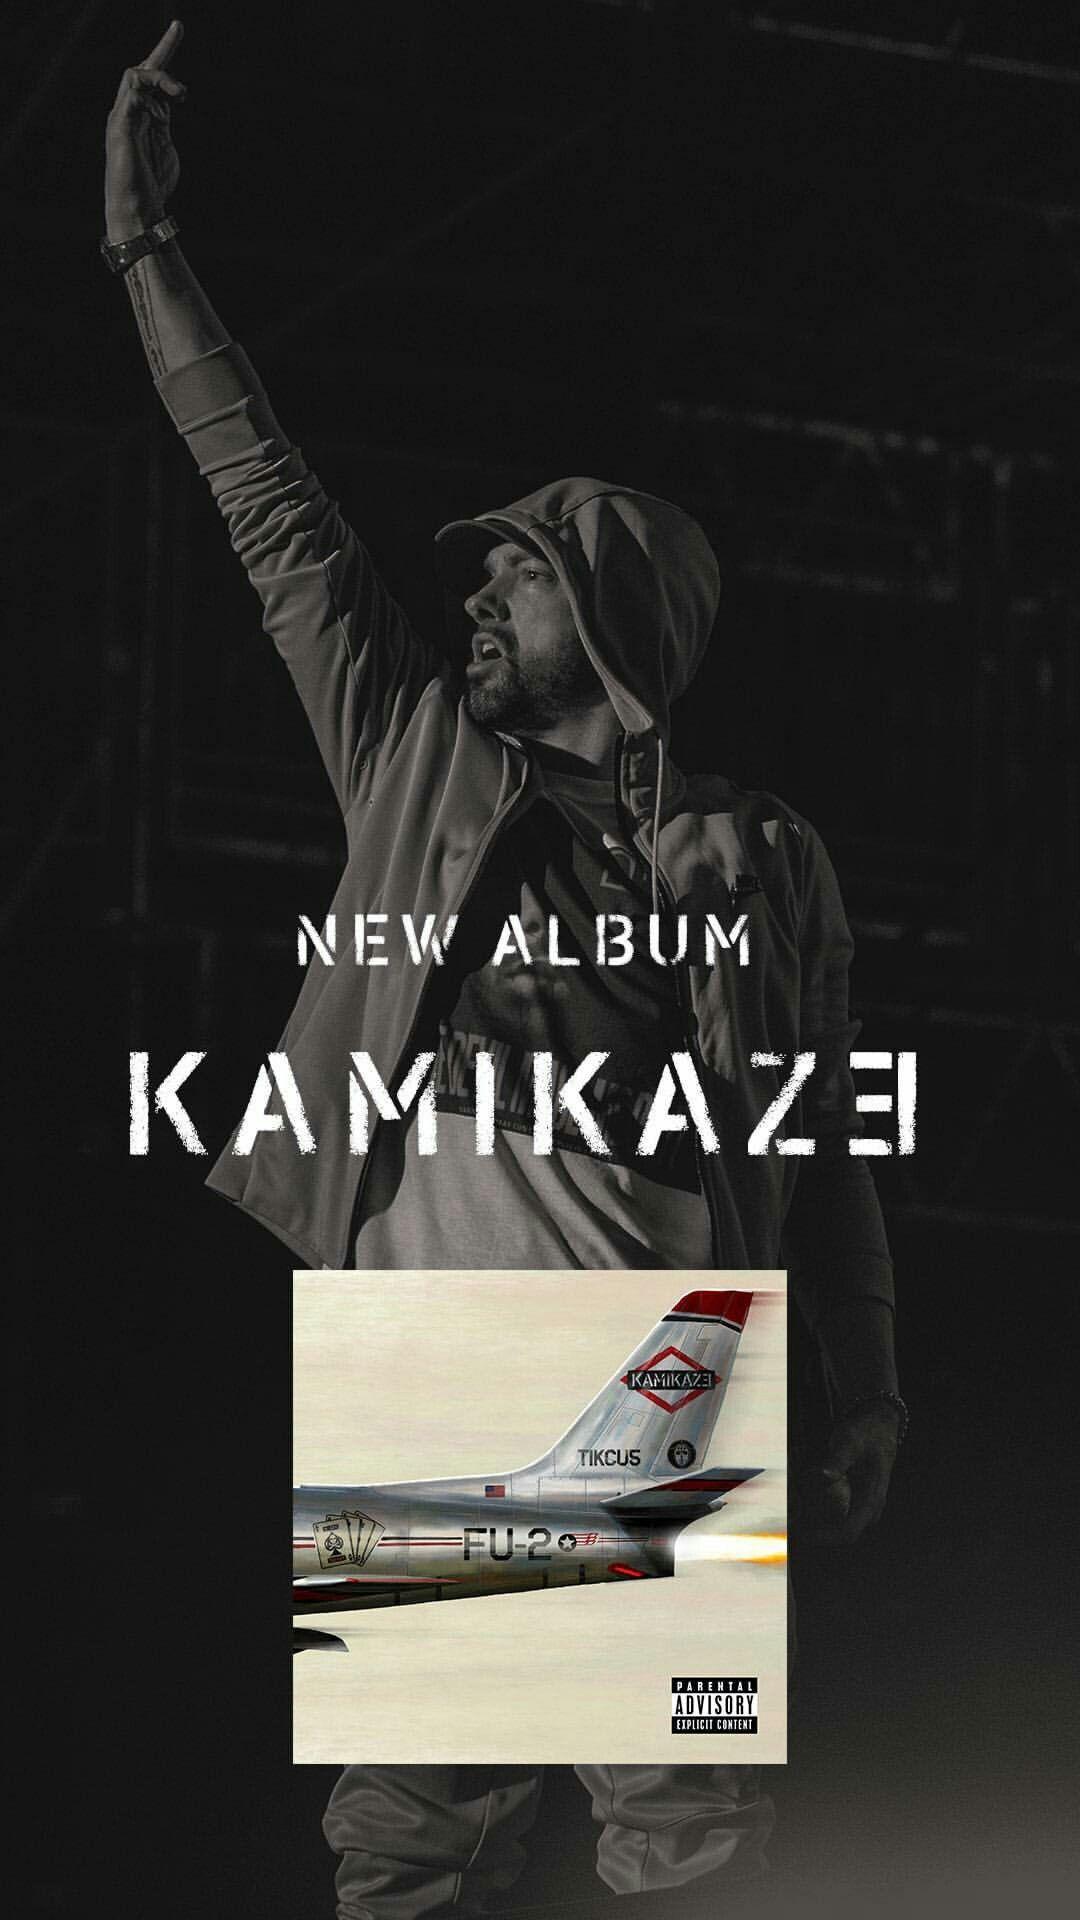 Eminem's record breaking surprise album release, Kamikaze